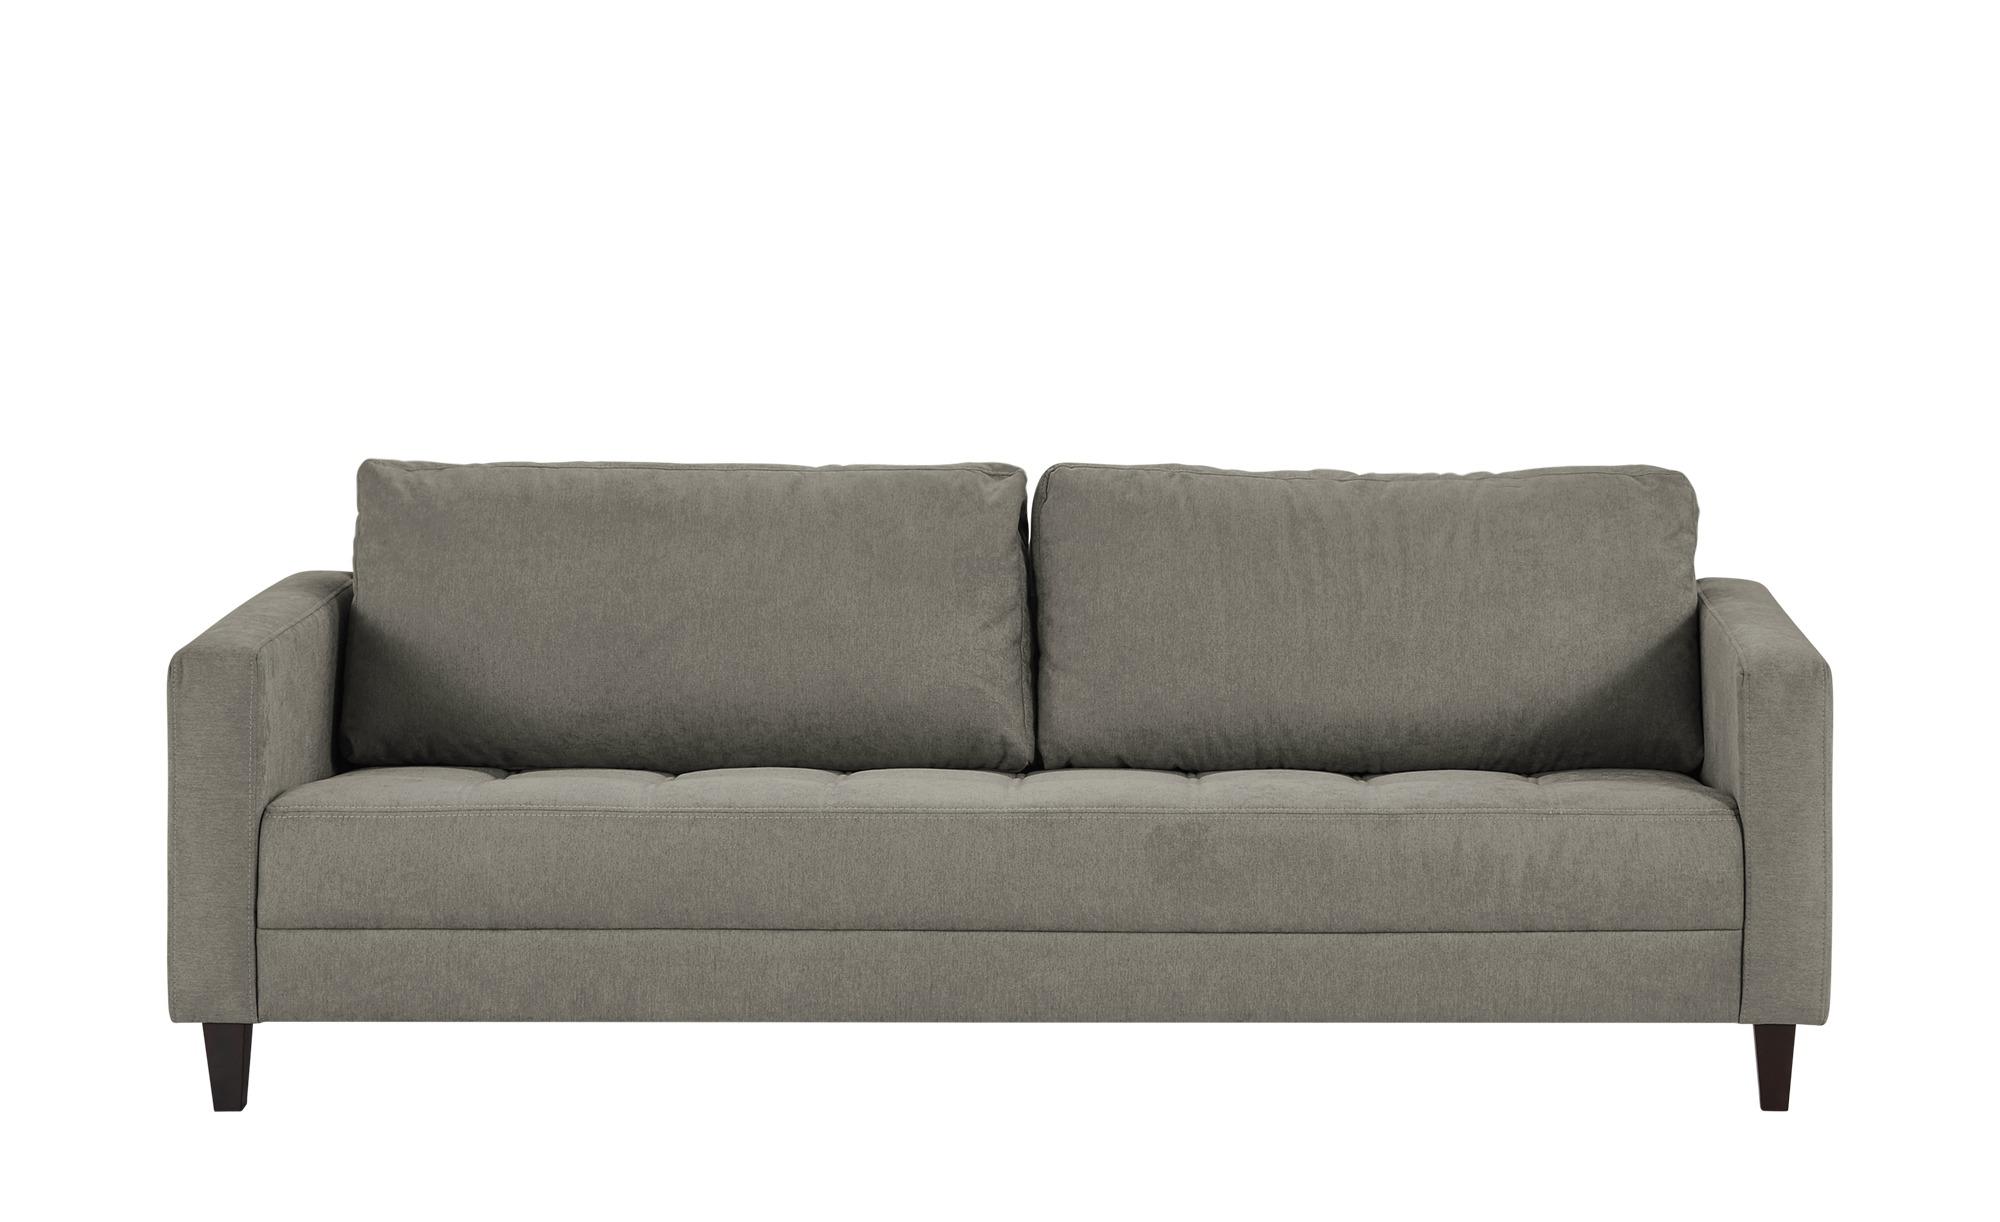 smart Sofa grau-braun - Flachgewebe Geradine ¦ grau ¦ Maße (cm): B: 228 H: 83 T: 91 Polstermöbel > Sofas > 3-Sitzer - Höffner